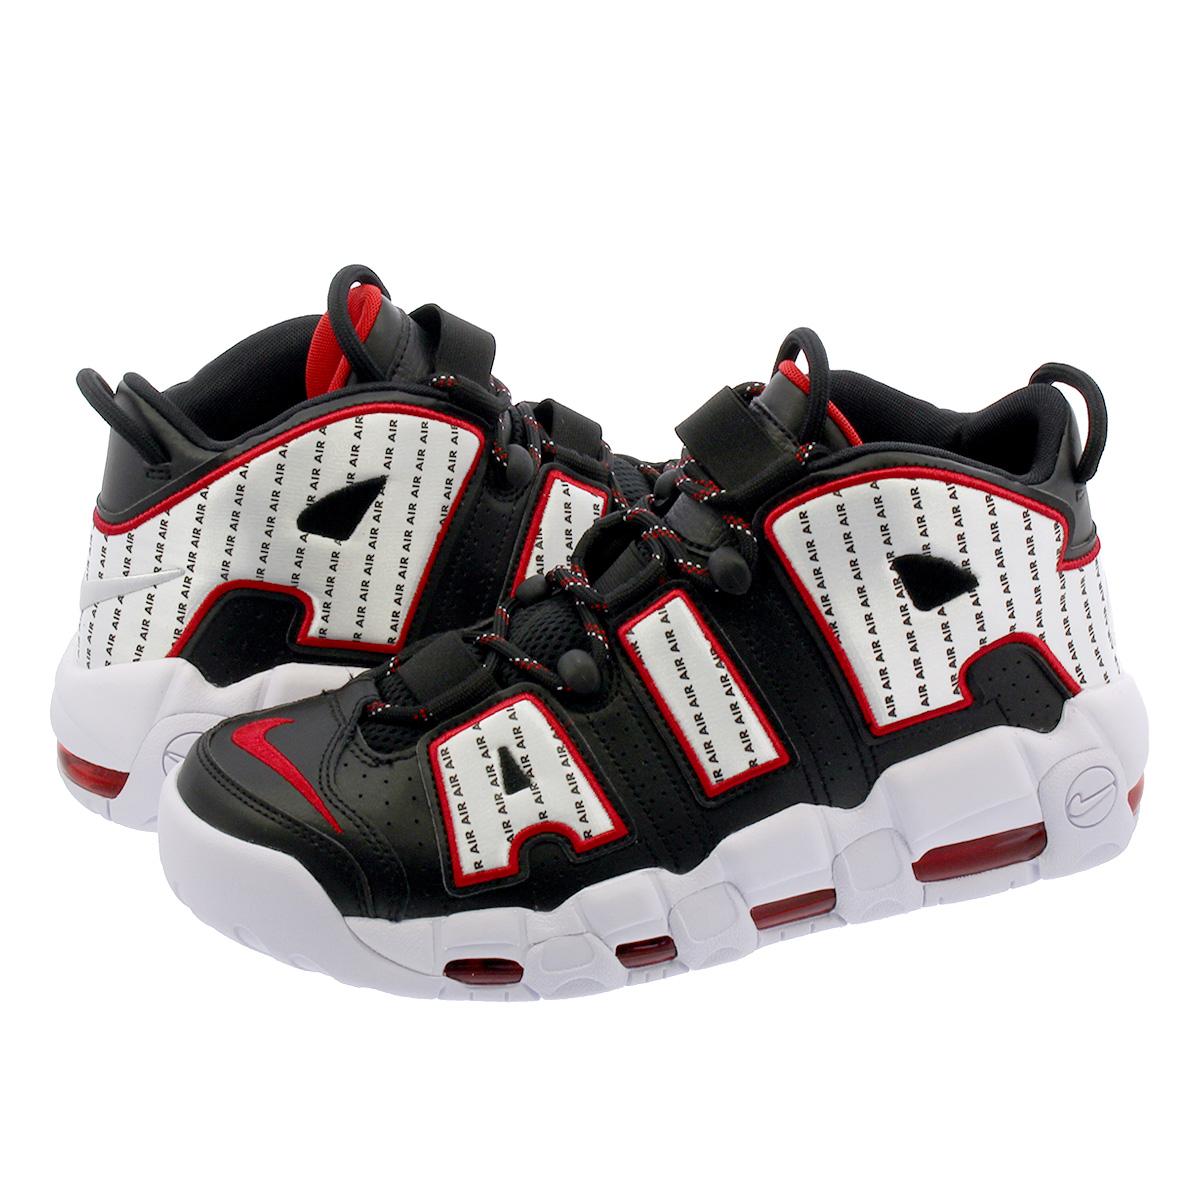 77004c87793c NIKE AIR MORE UPTEMPO 96 Nike air more up tempo 96 BLACK/WHITE/UNIVERSITY  ...